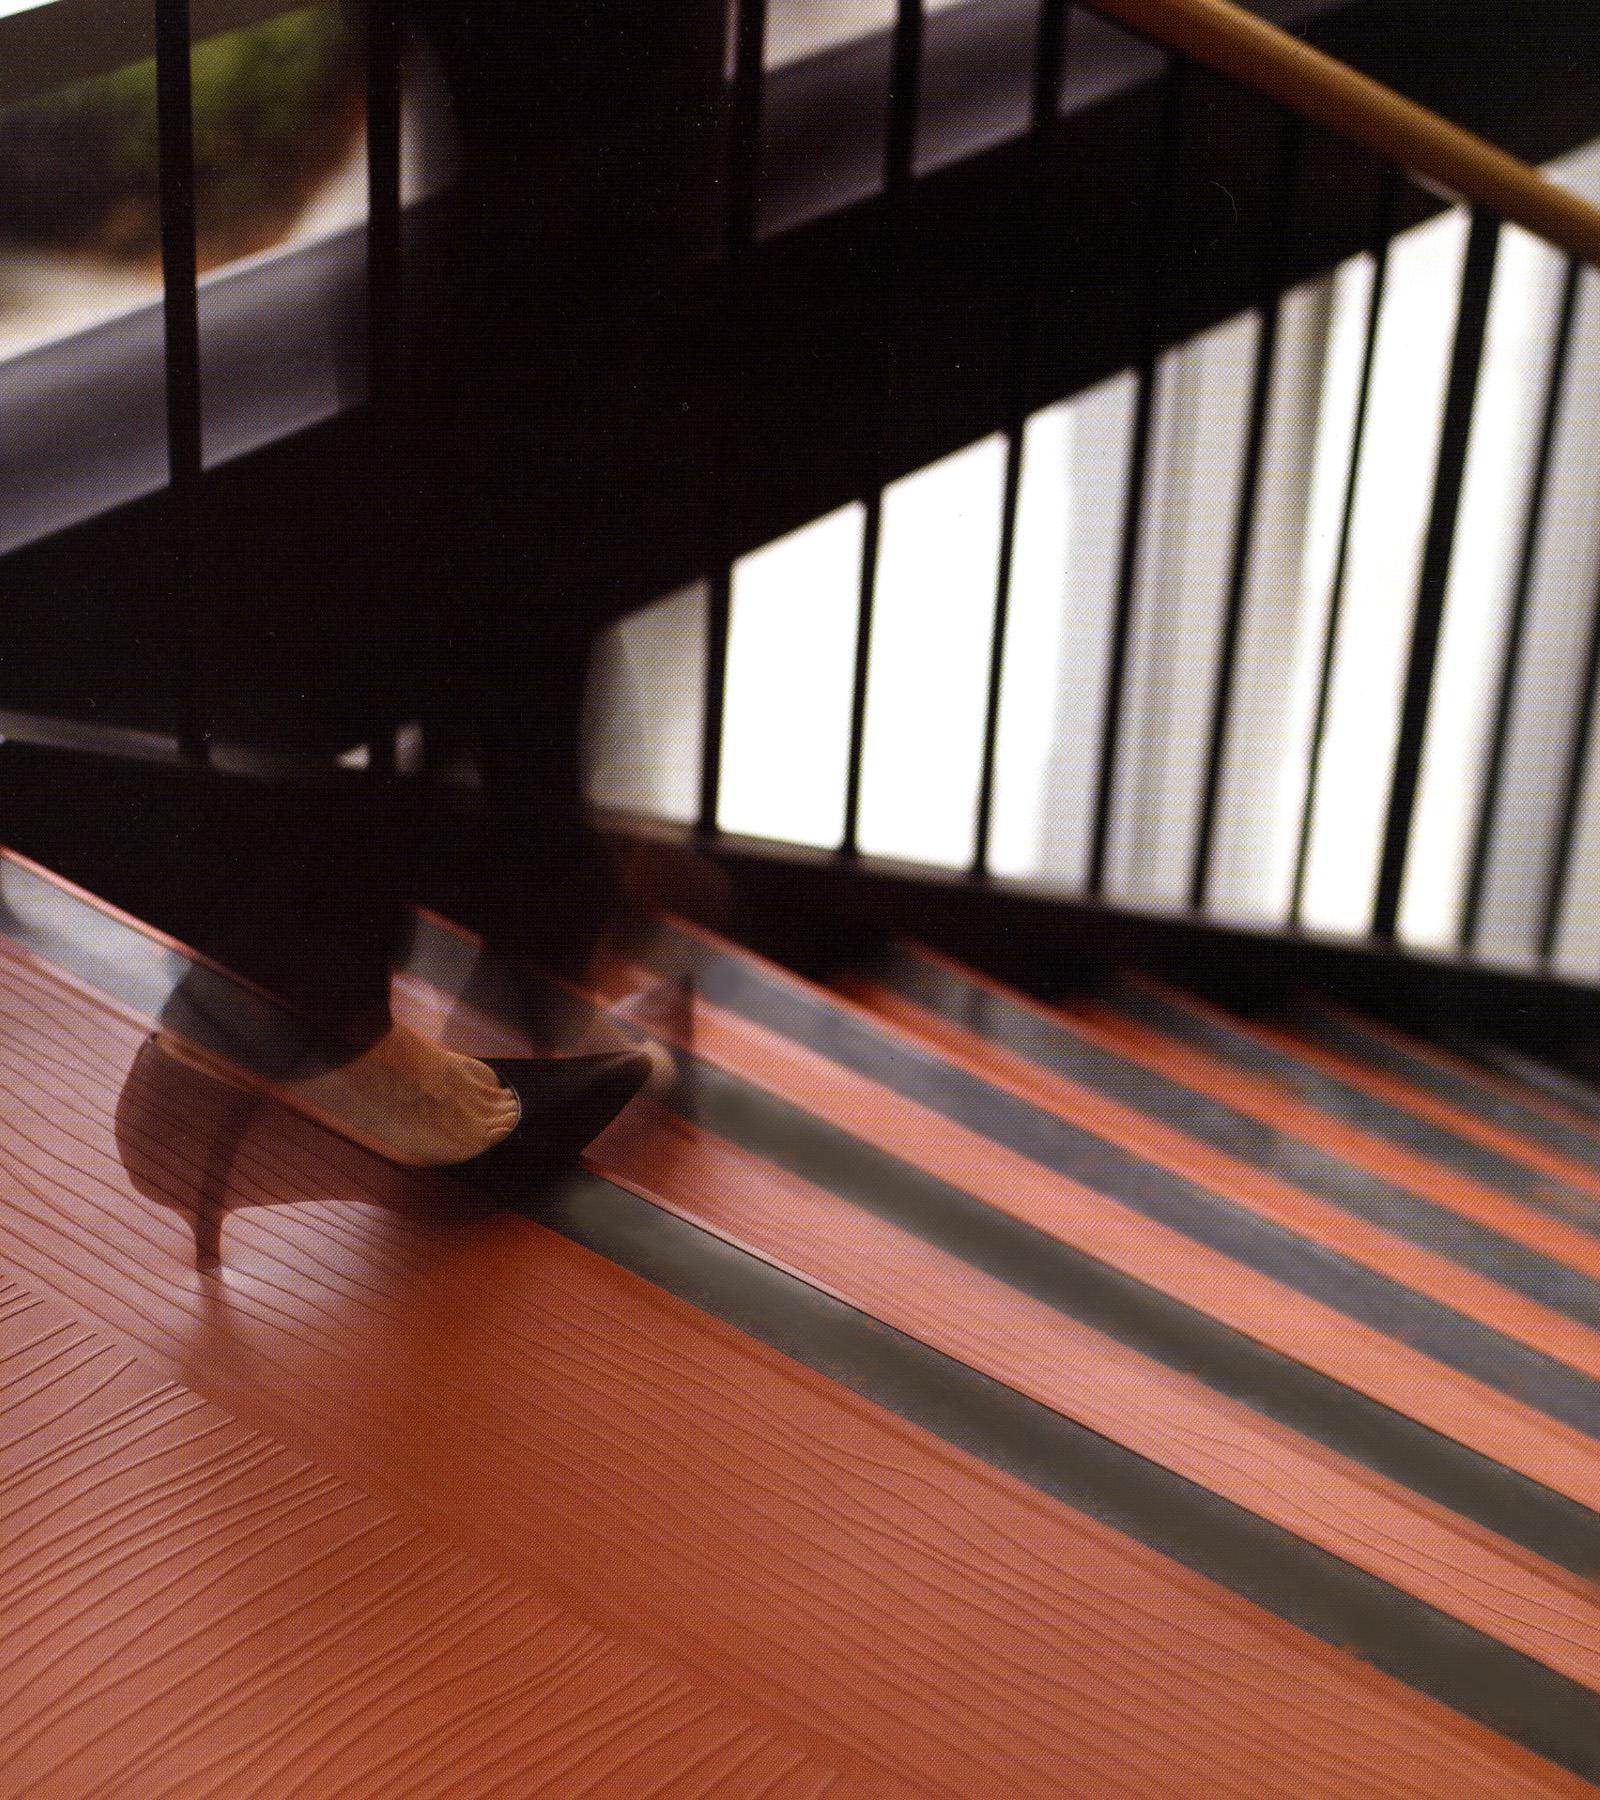 New Anti Slip Grit Tape For Safer Vinyl And Rubber Stair